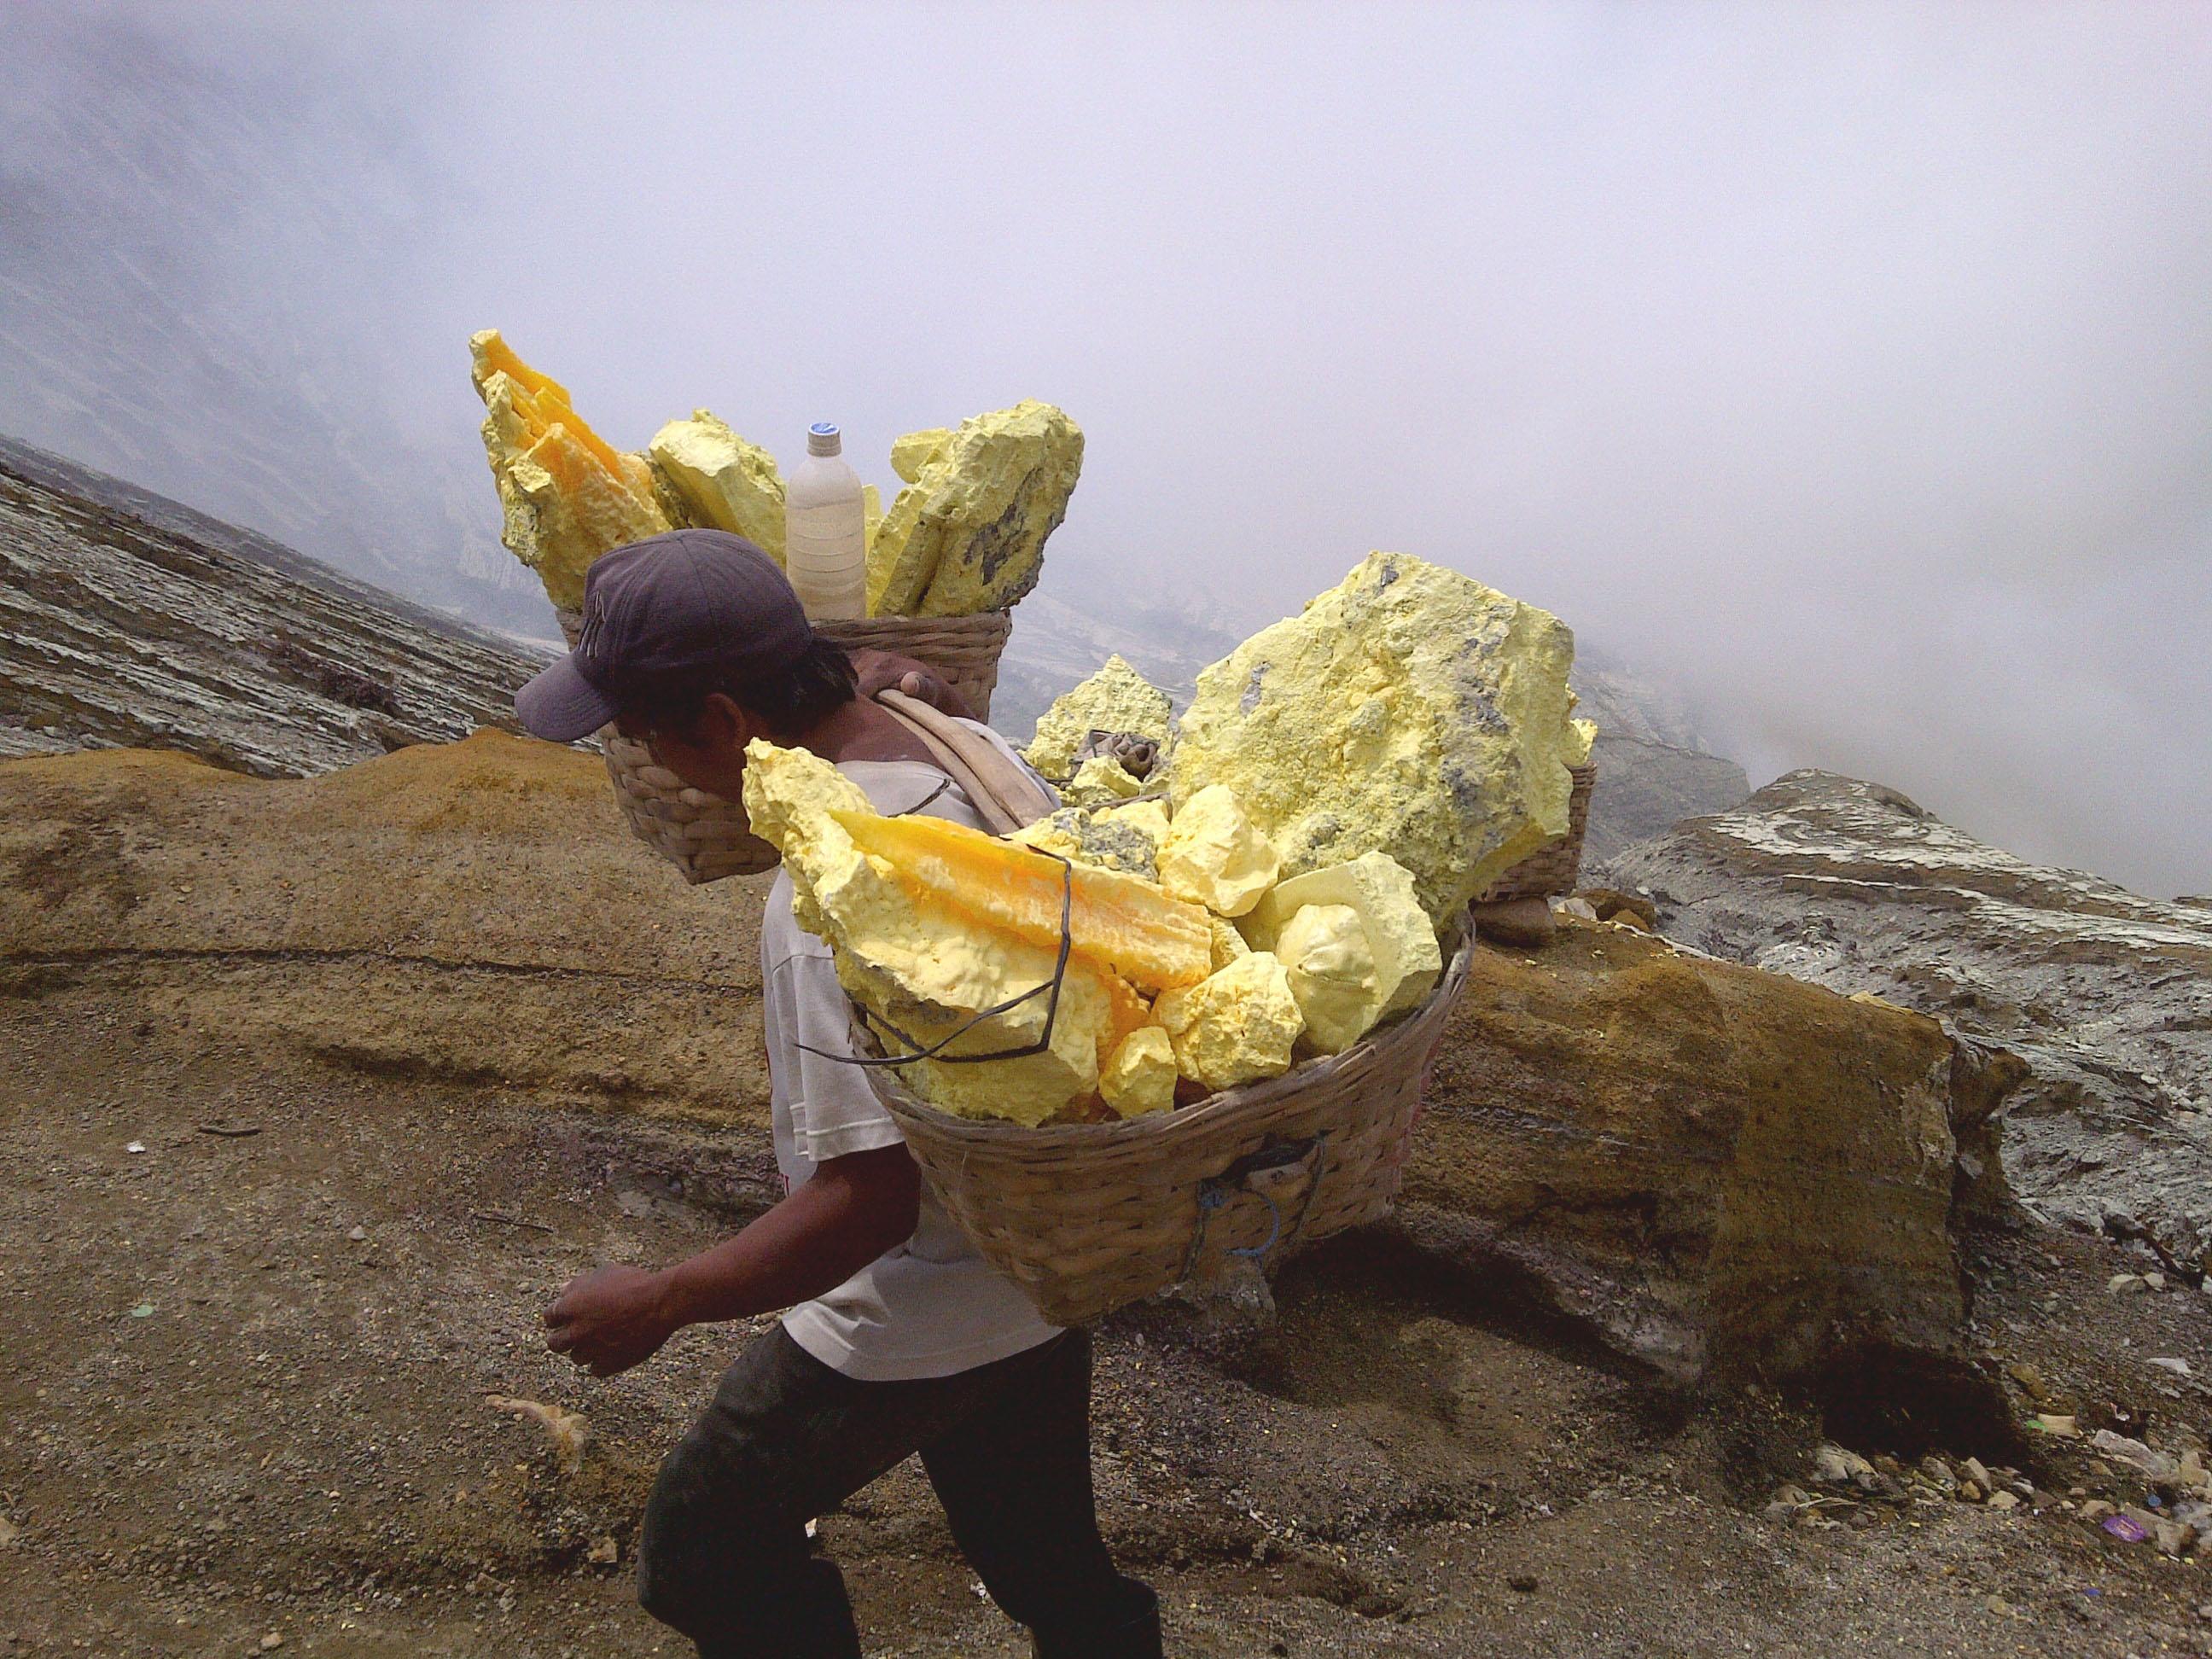 the_sulfur_miner_of_kawah_ijen_mountain_indonesia.jpg